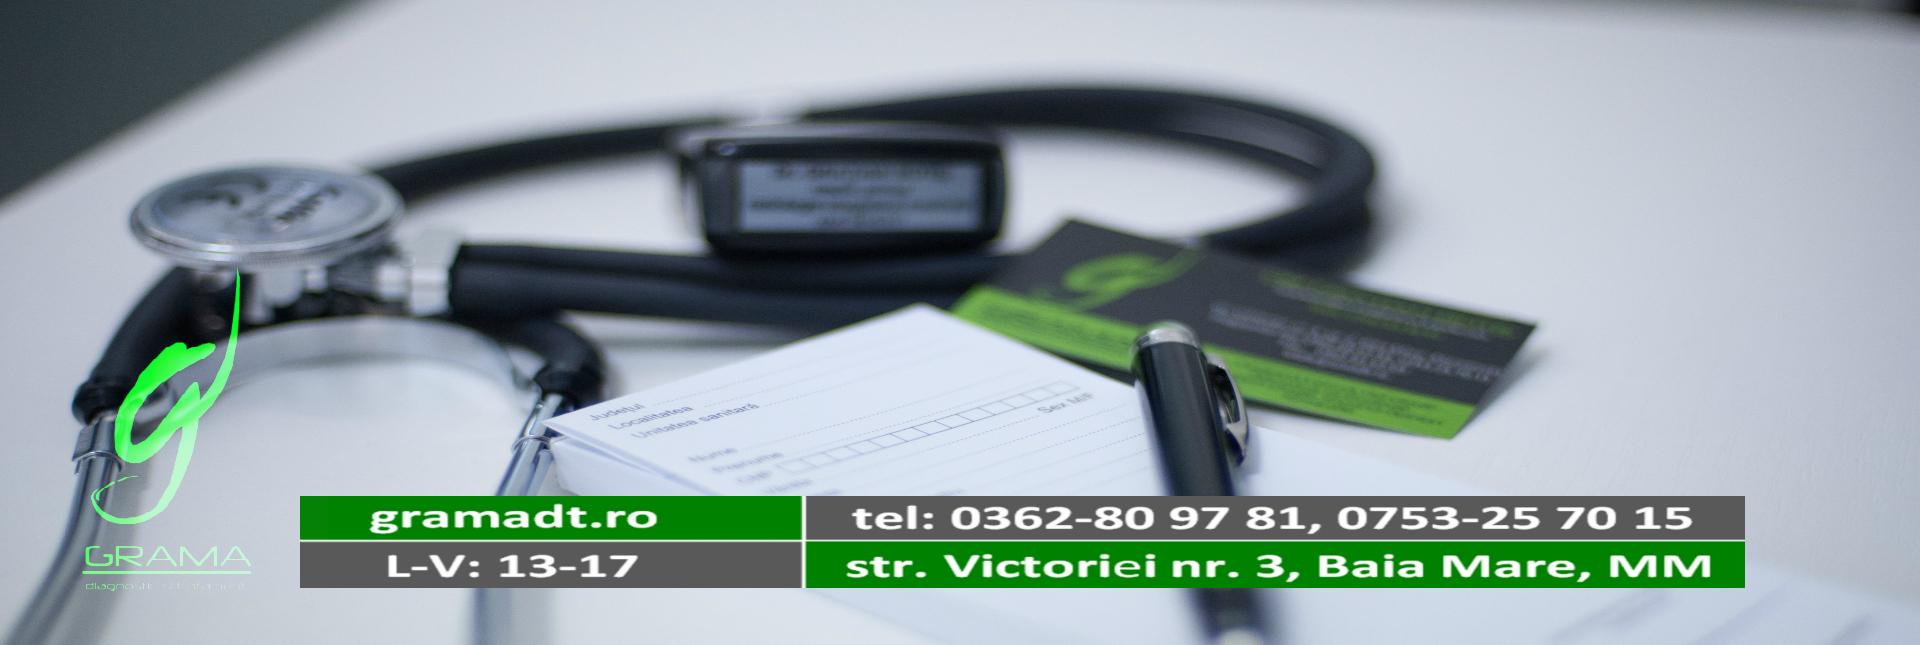 stetoscop-parafa-endo-grama-site